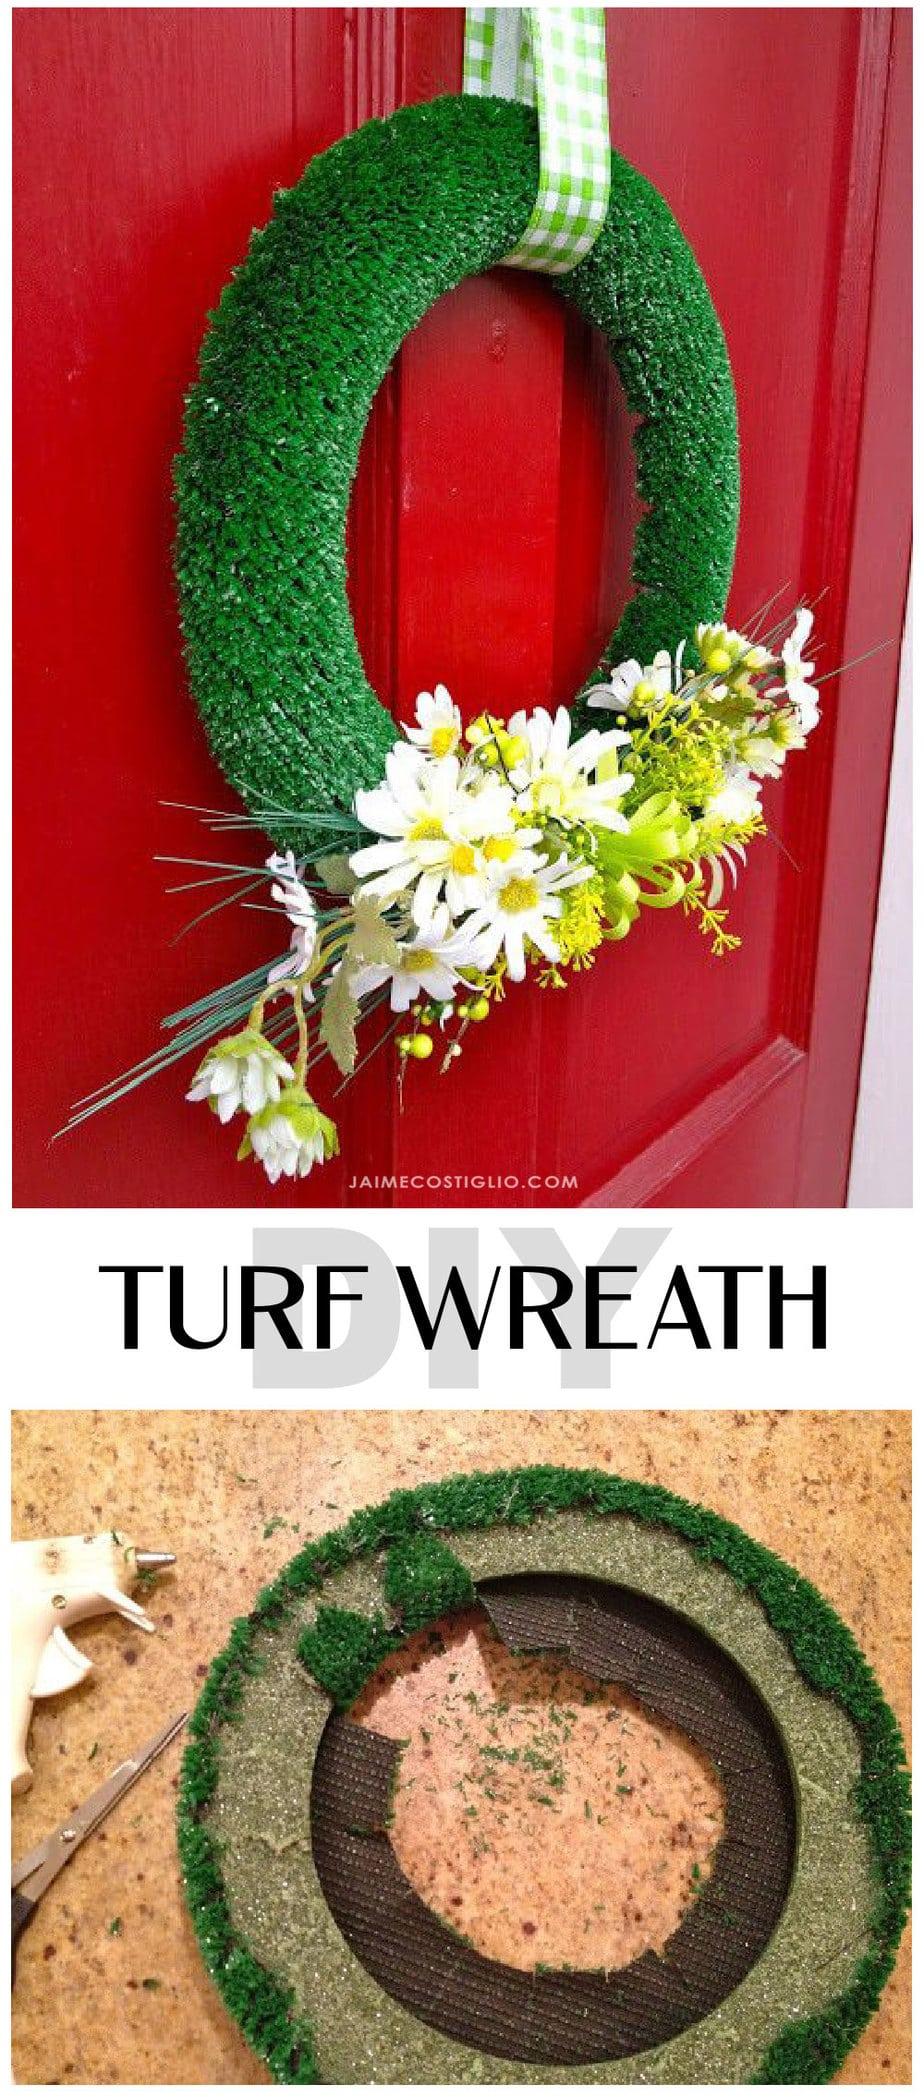 turf wreath tutorial